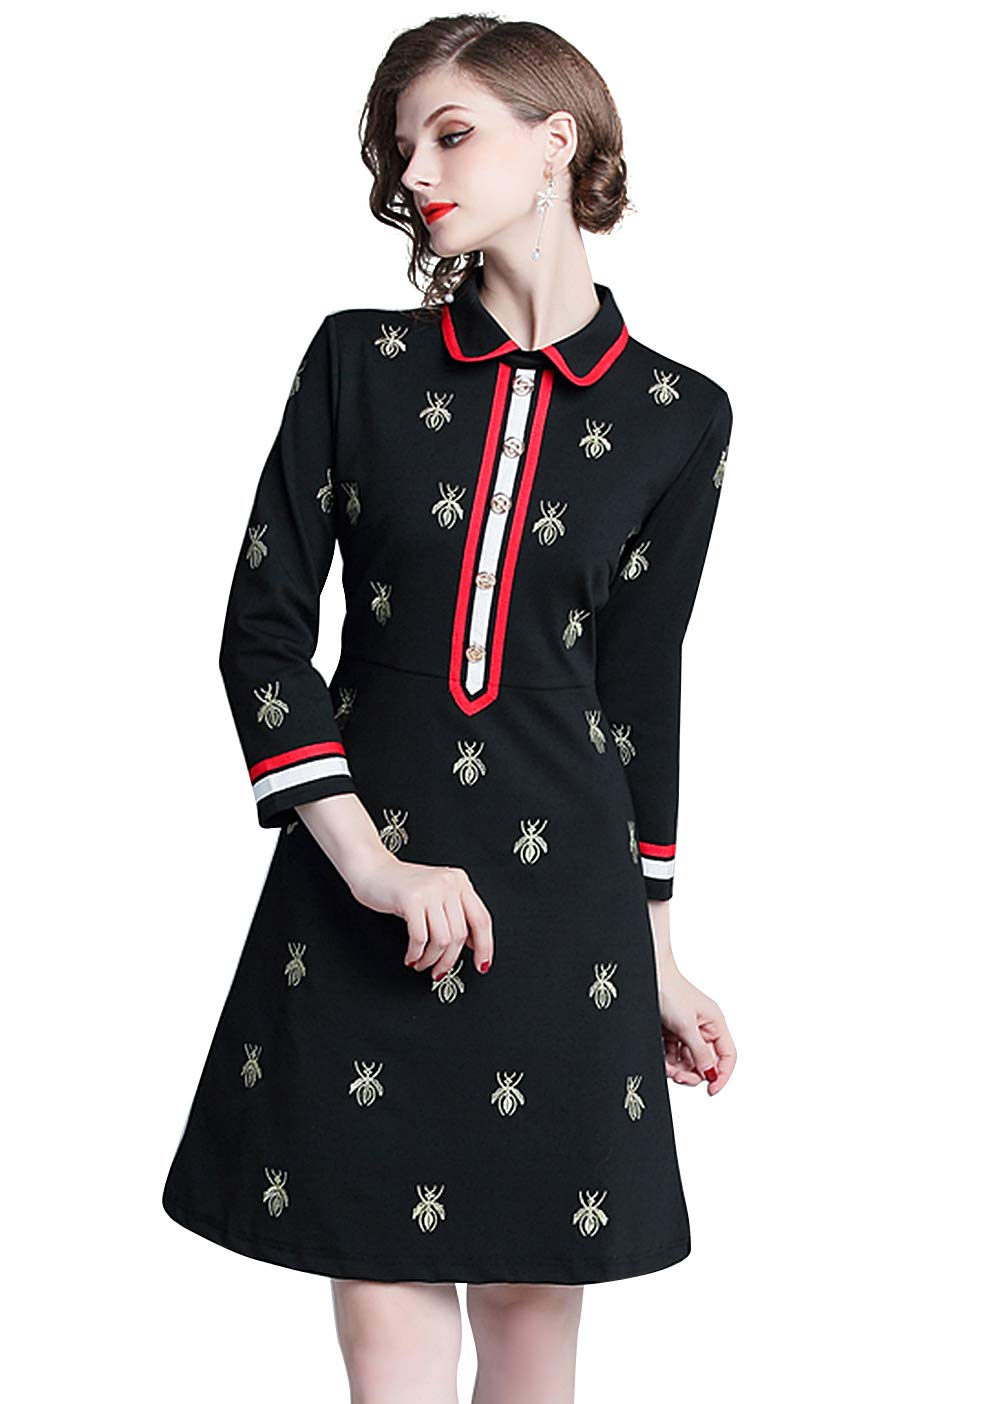 Womens Premium Embroidered Collared Neck/V Neck Slim Bodycon Work Business Dress